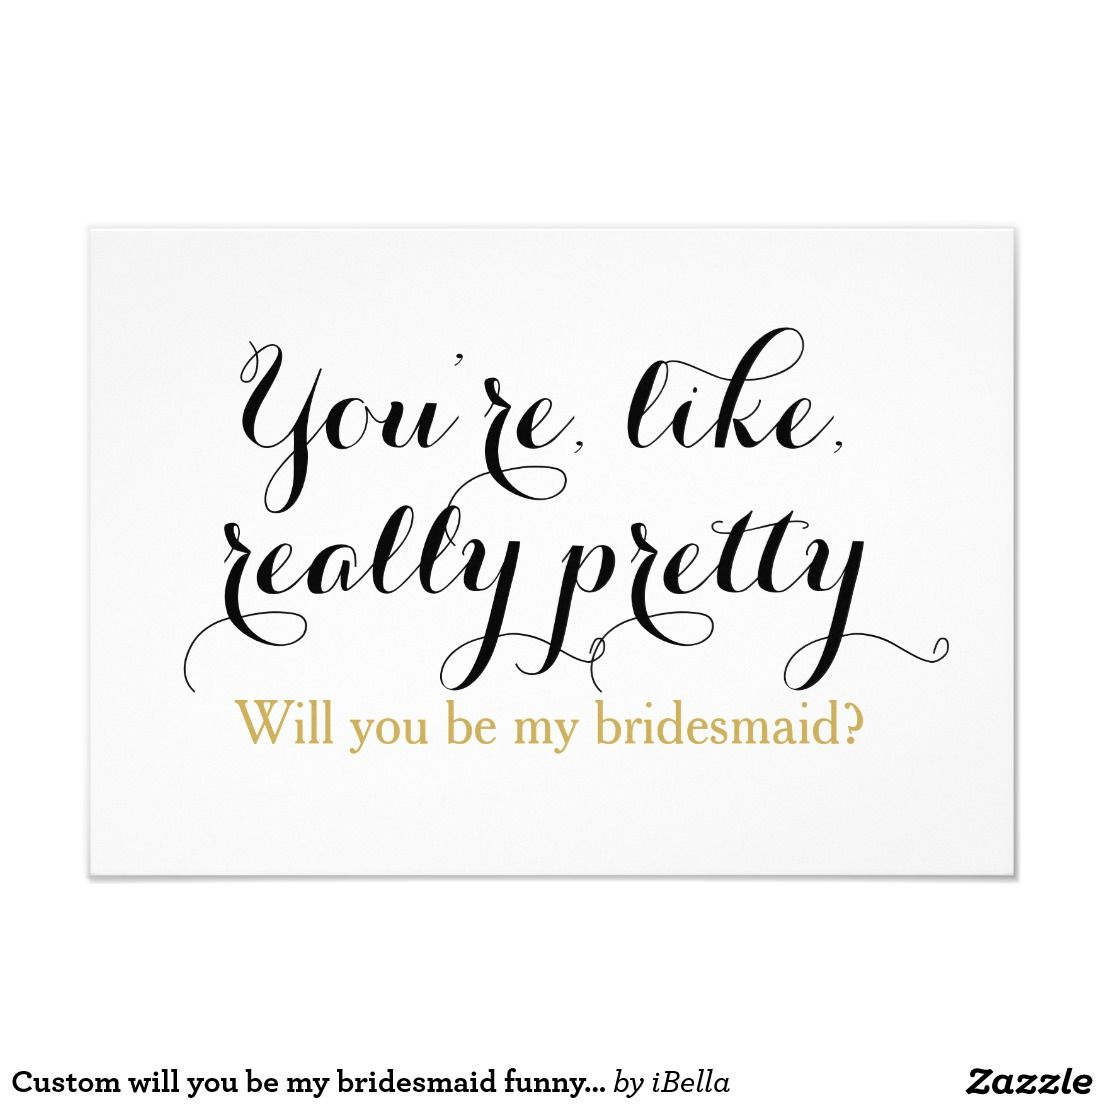 Custom will you be my bridesmaid funny wedding invitation